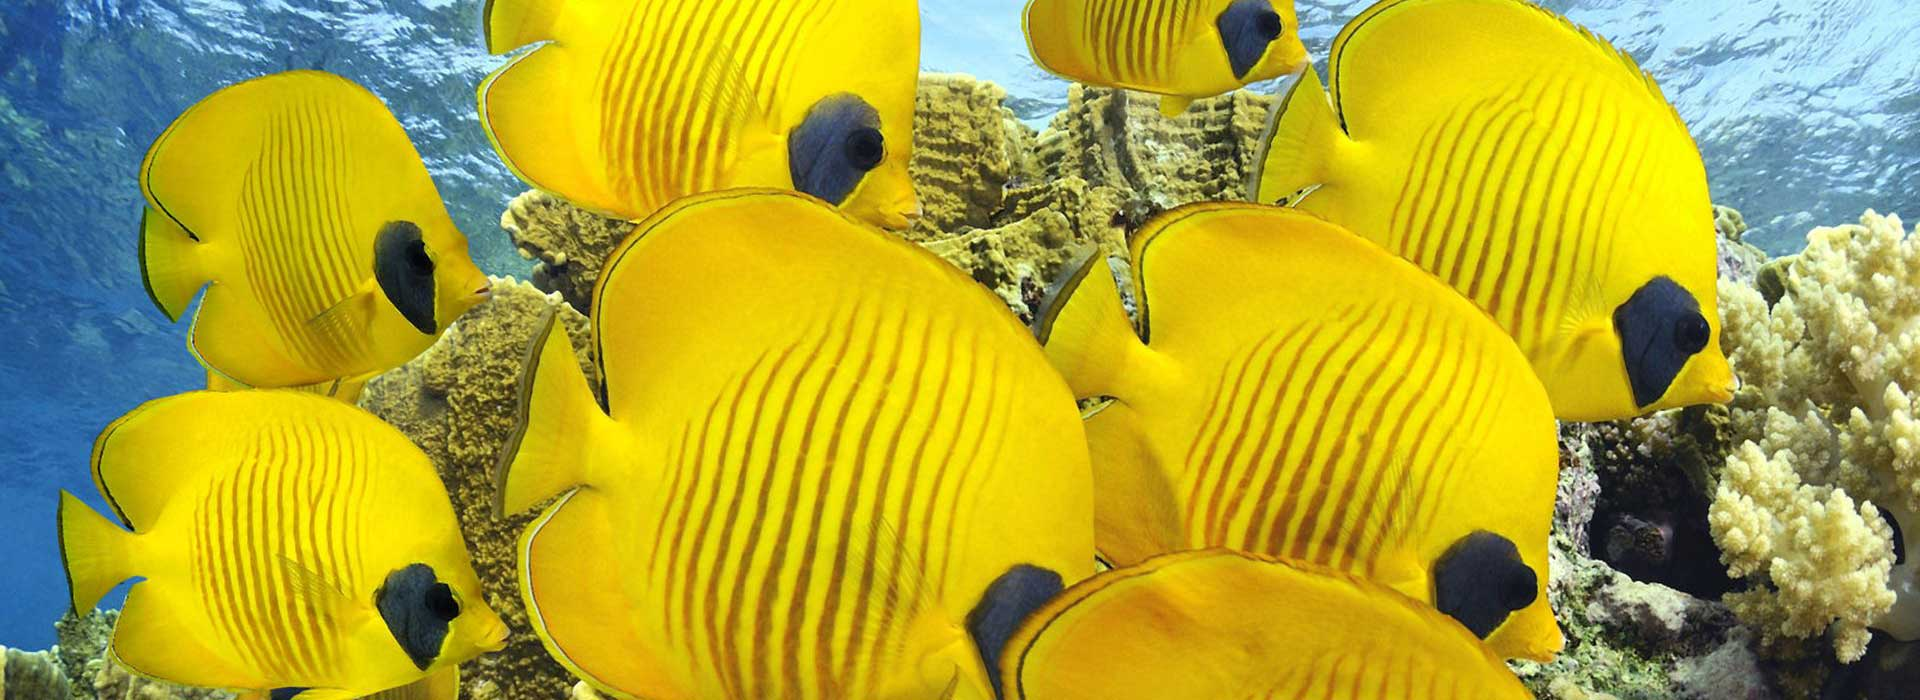 poissons-corail